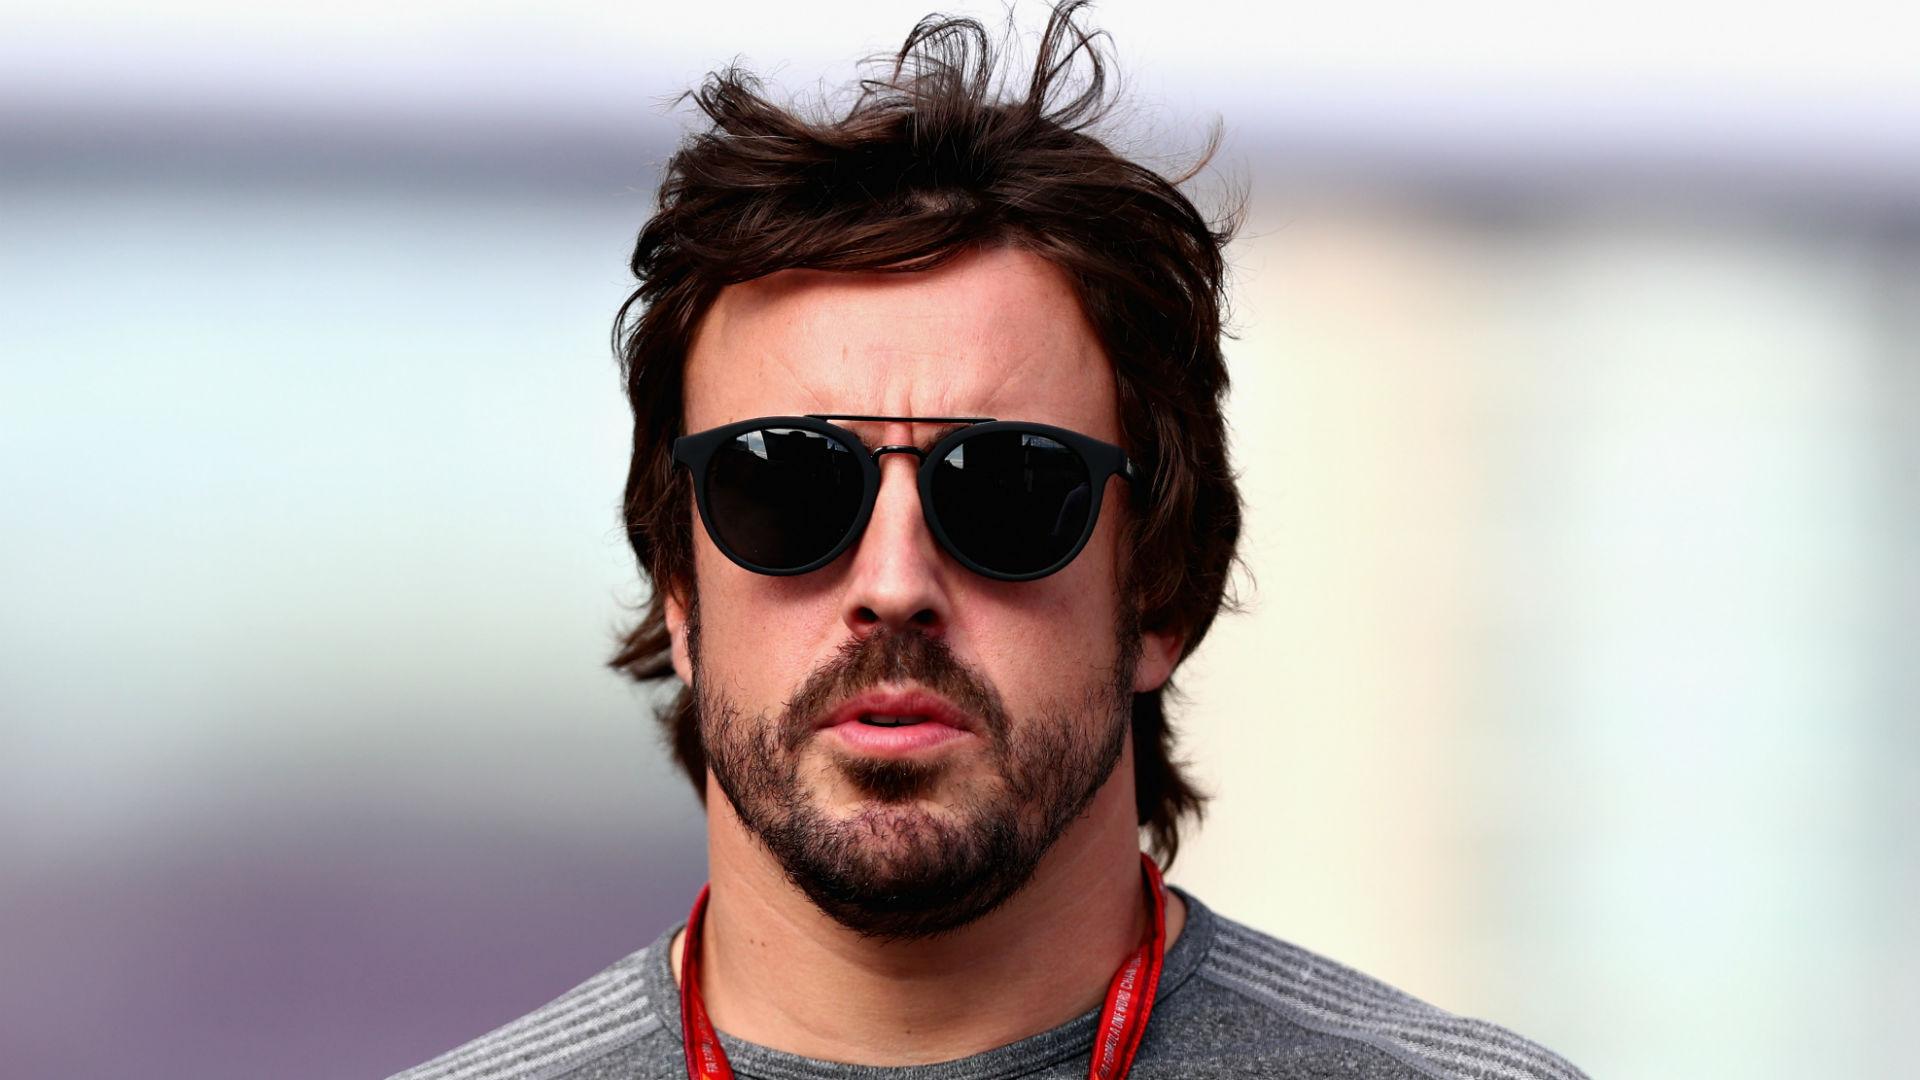 Formula One star Fernando Alonso to race in Rolex 24 at Daytona | NASCAR | Sporting News